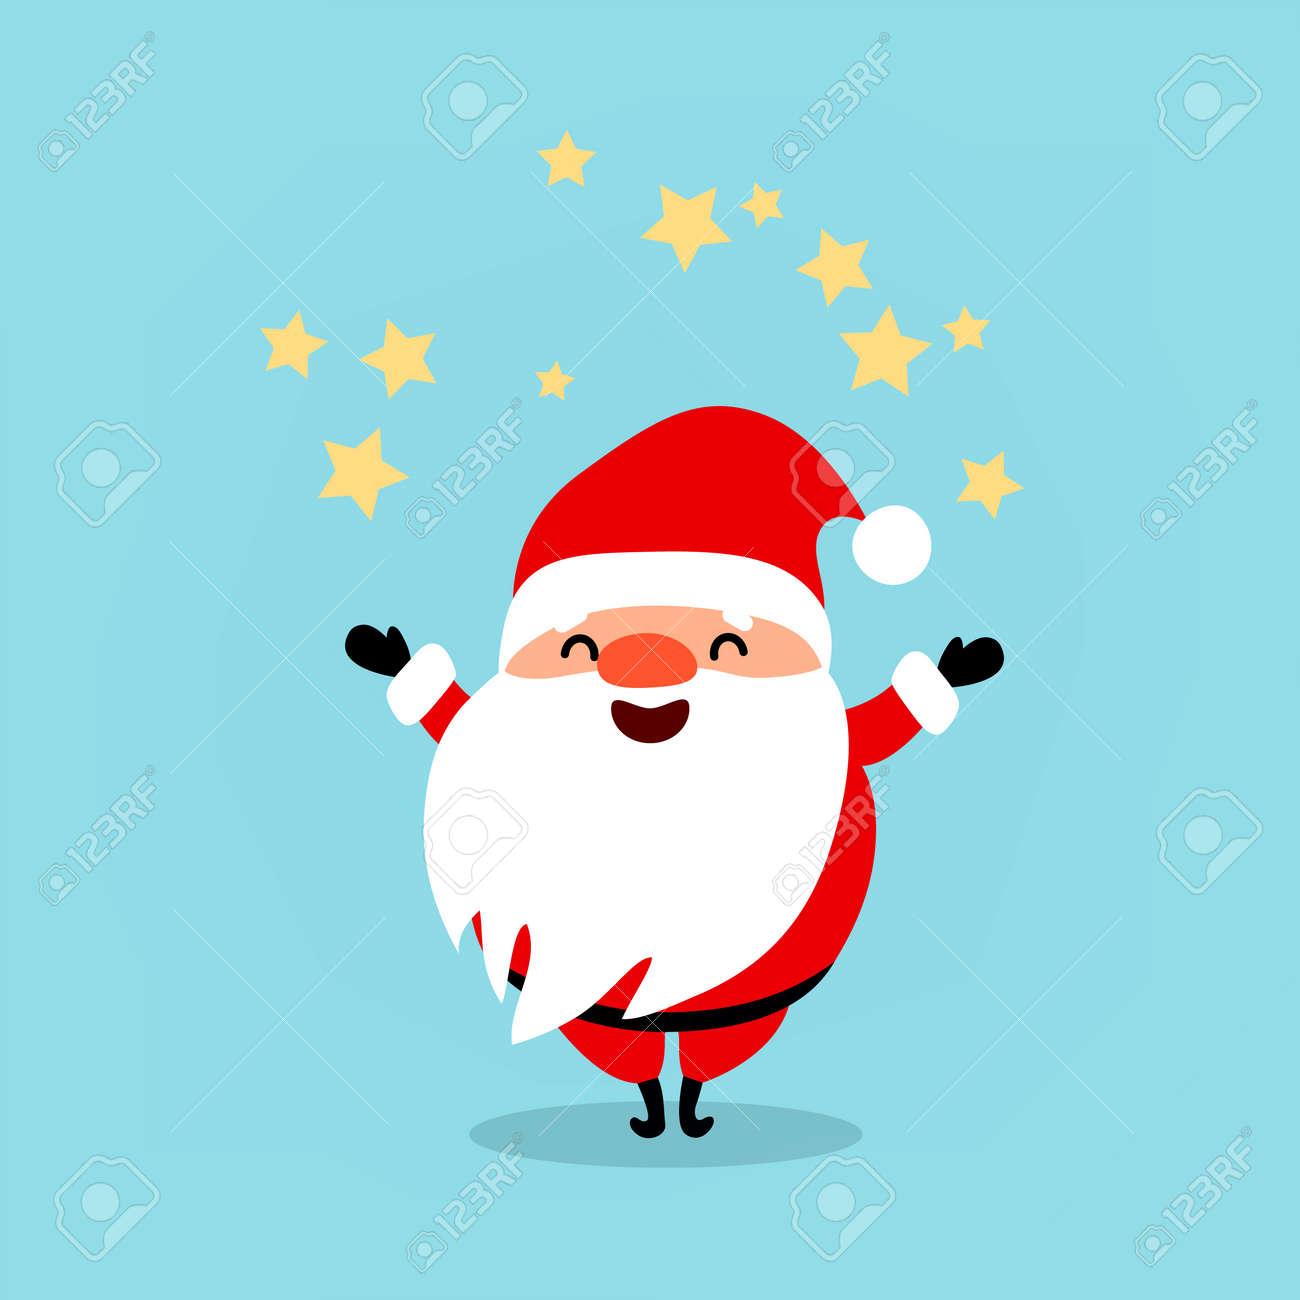 Funny Santa Claus / Vector Christmas Illustration, Sign Thumbs.. Royalty Free  Cliparts, Vectors, And Stock Illustration. Image 87427988.